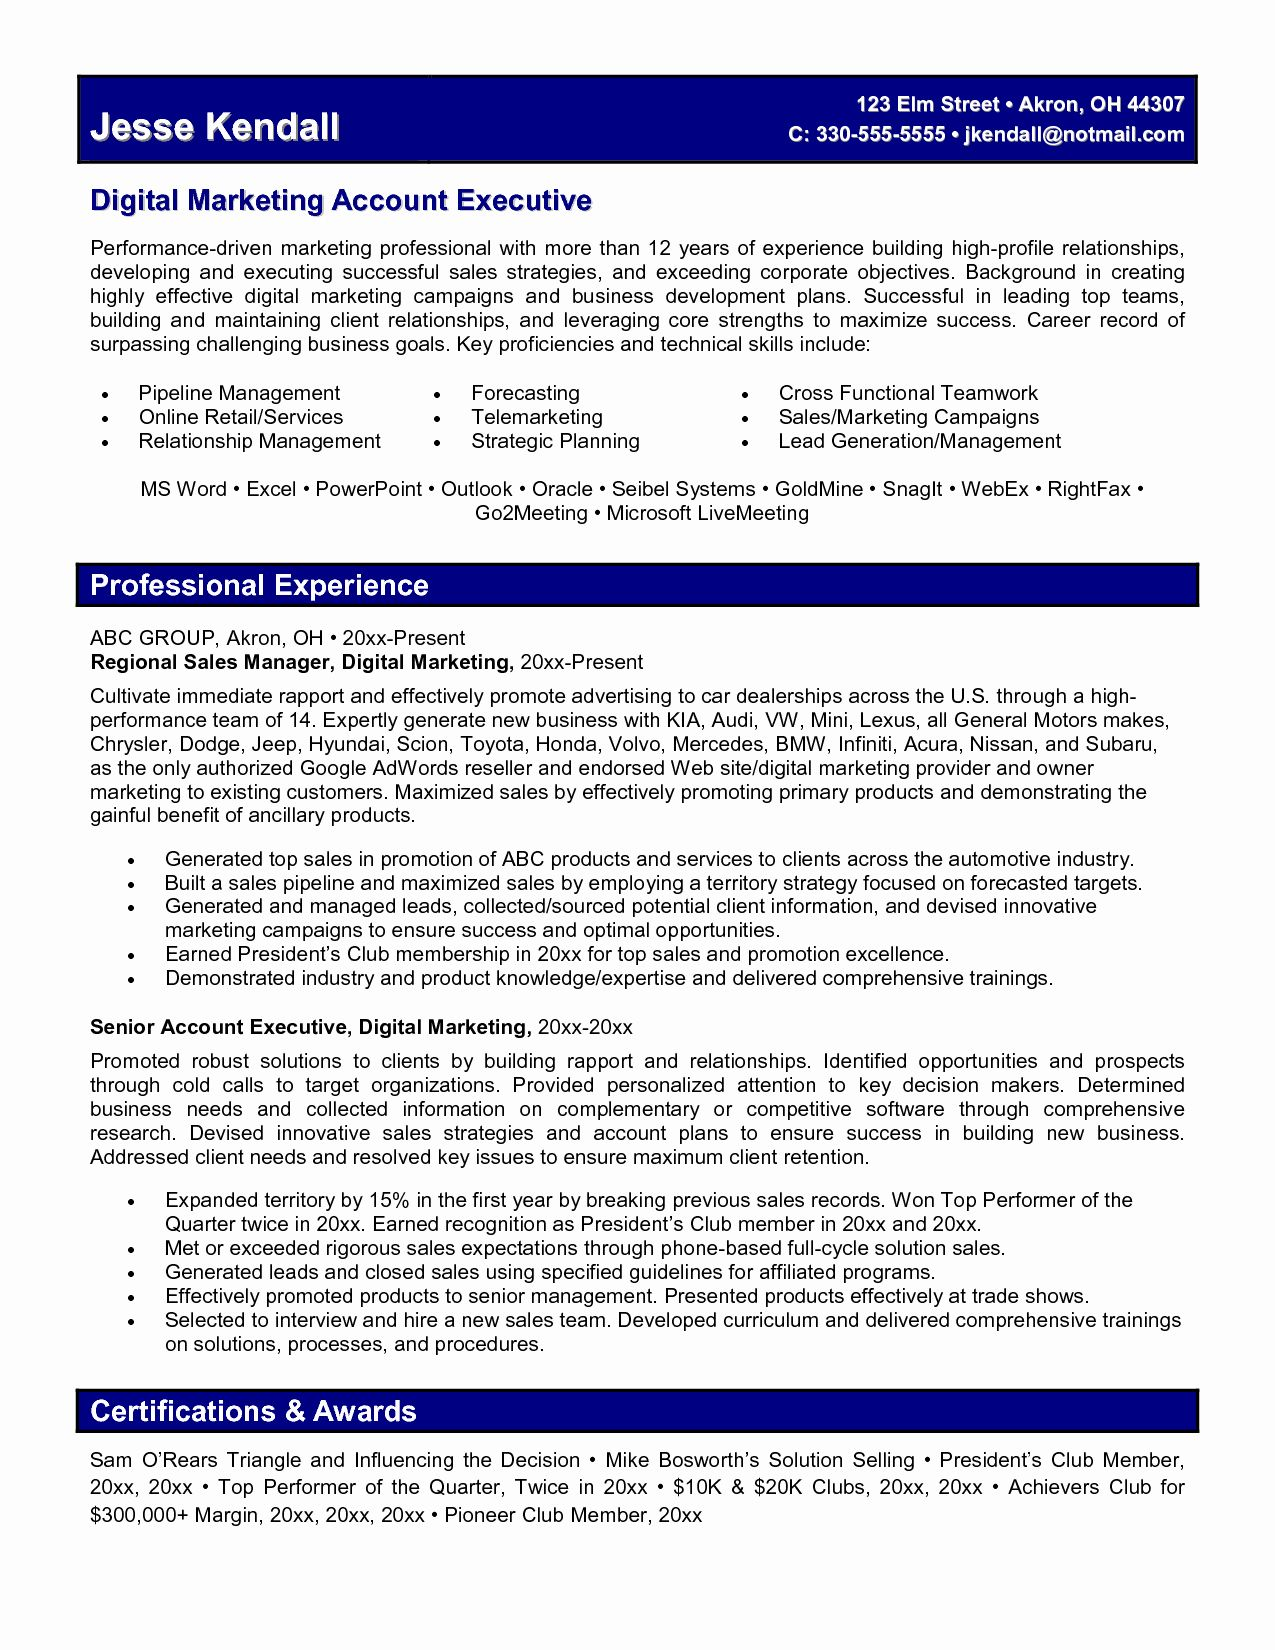 marketing manager resume sample free